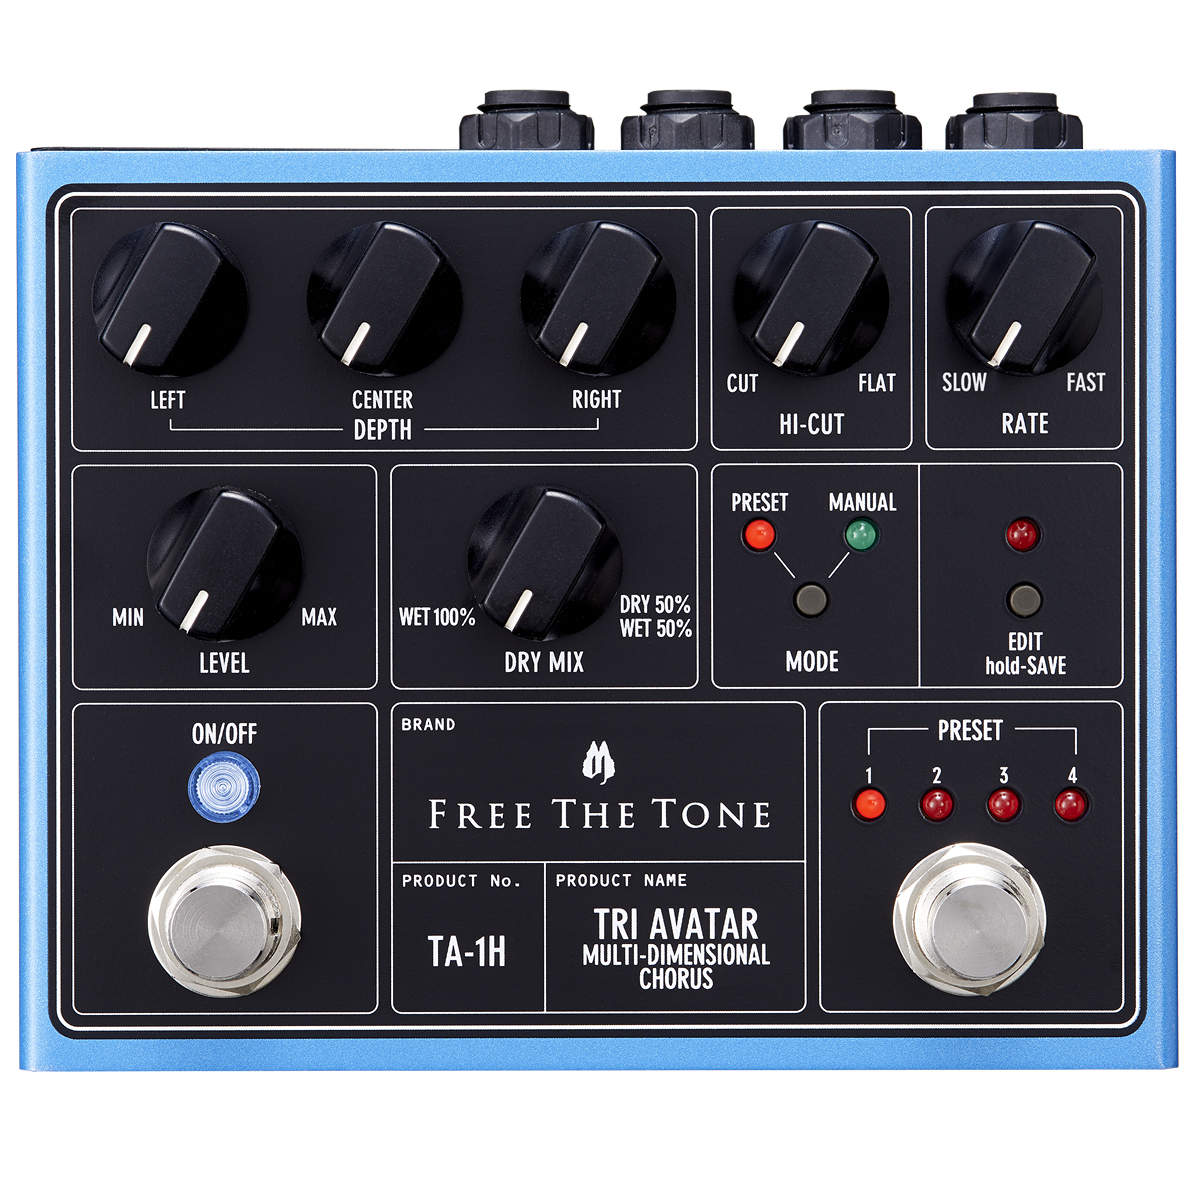 Free The Tone TA-1H TRI AVATAR The Multi-Dimensional Chorus Chorus TA-1H 新品 コーラス[フリーザトーン][Chorus][エフェクター,Effector], 吉通ドラッグ:d612c640 --- ww.thecollagist.com